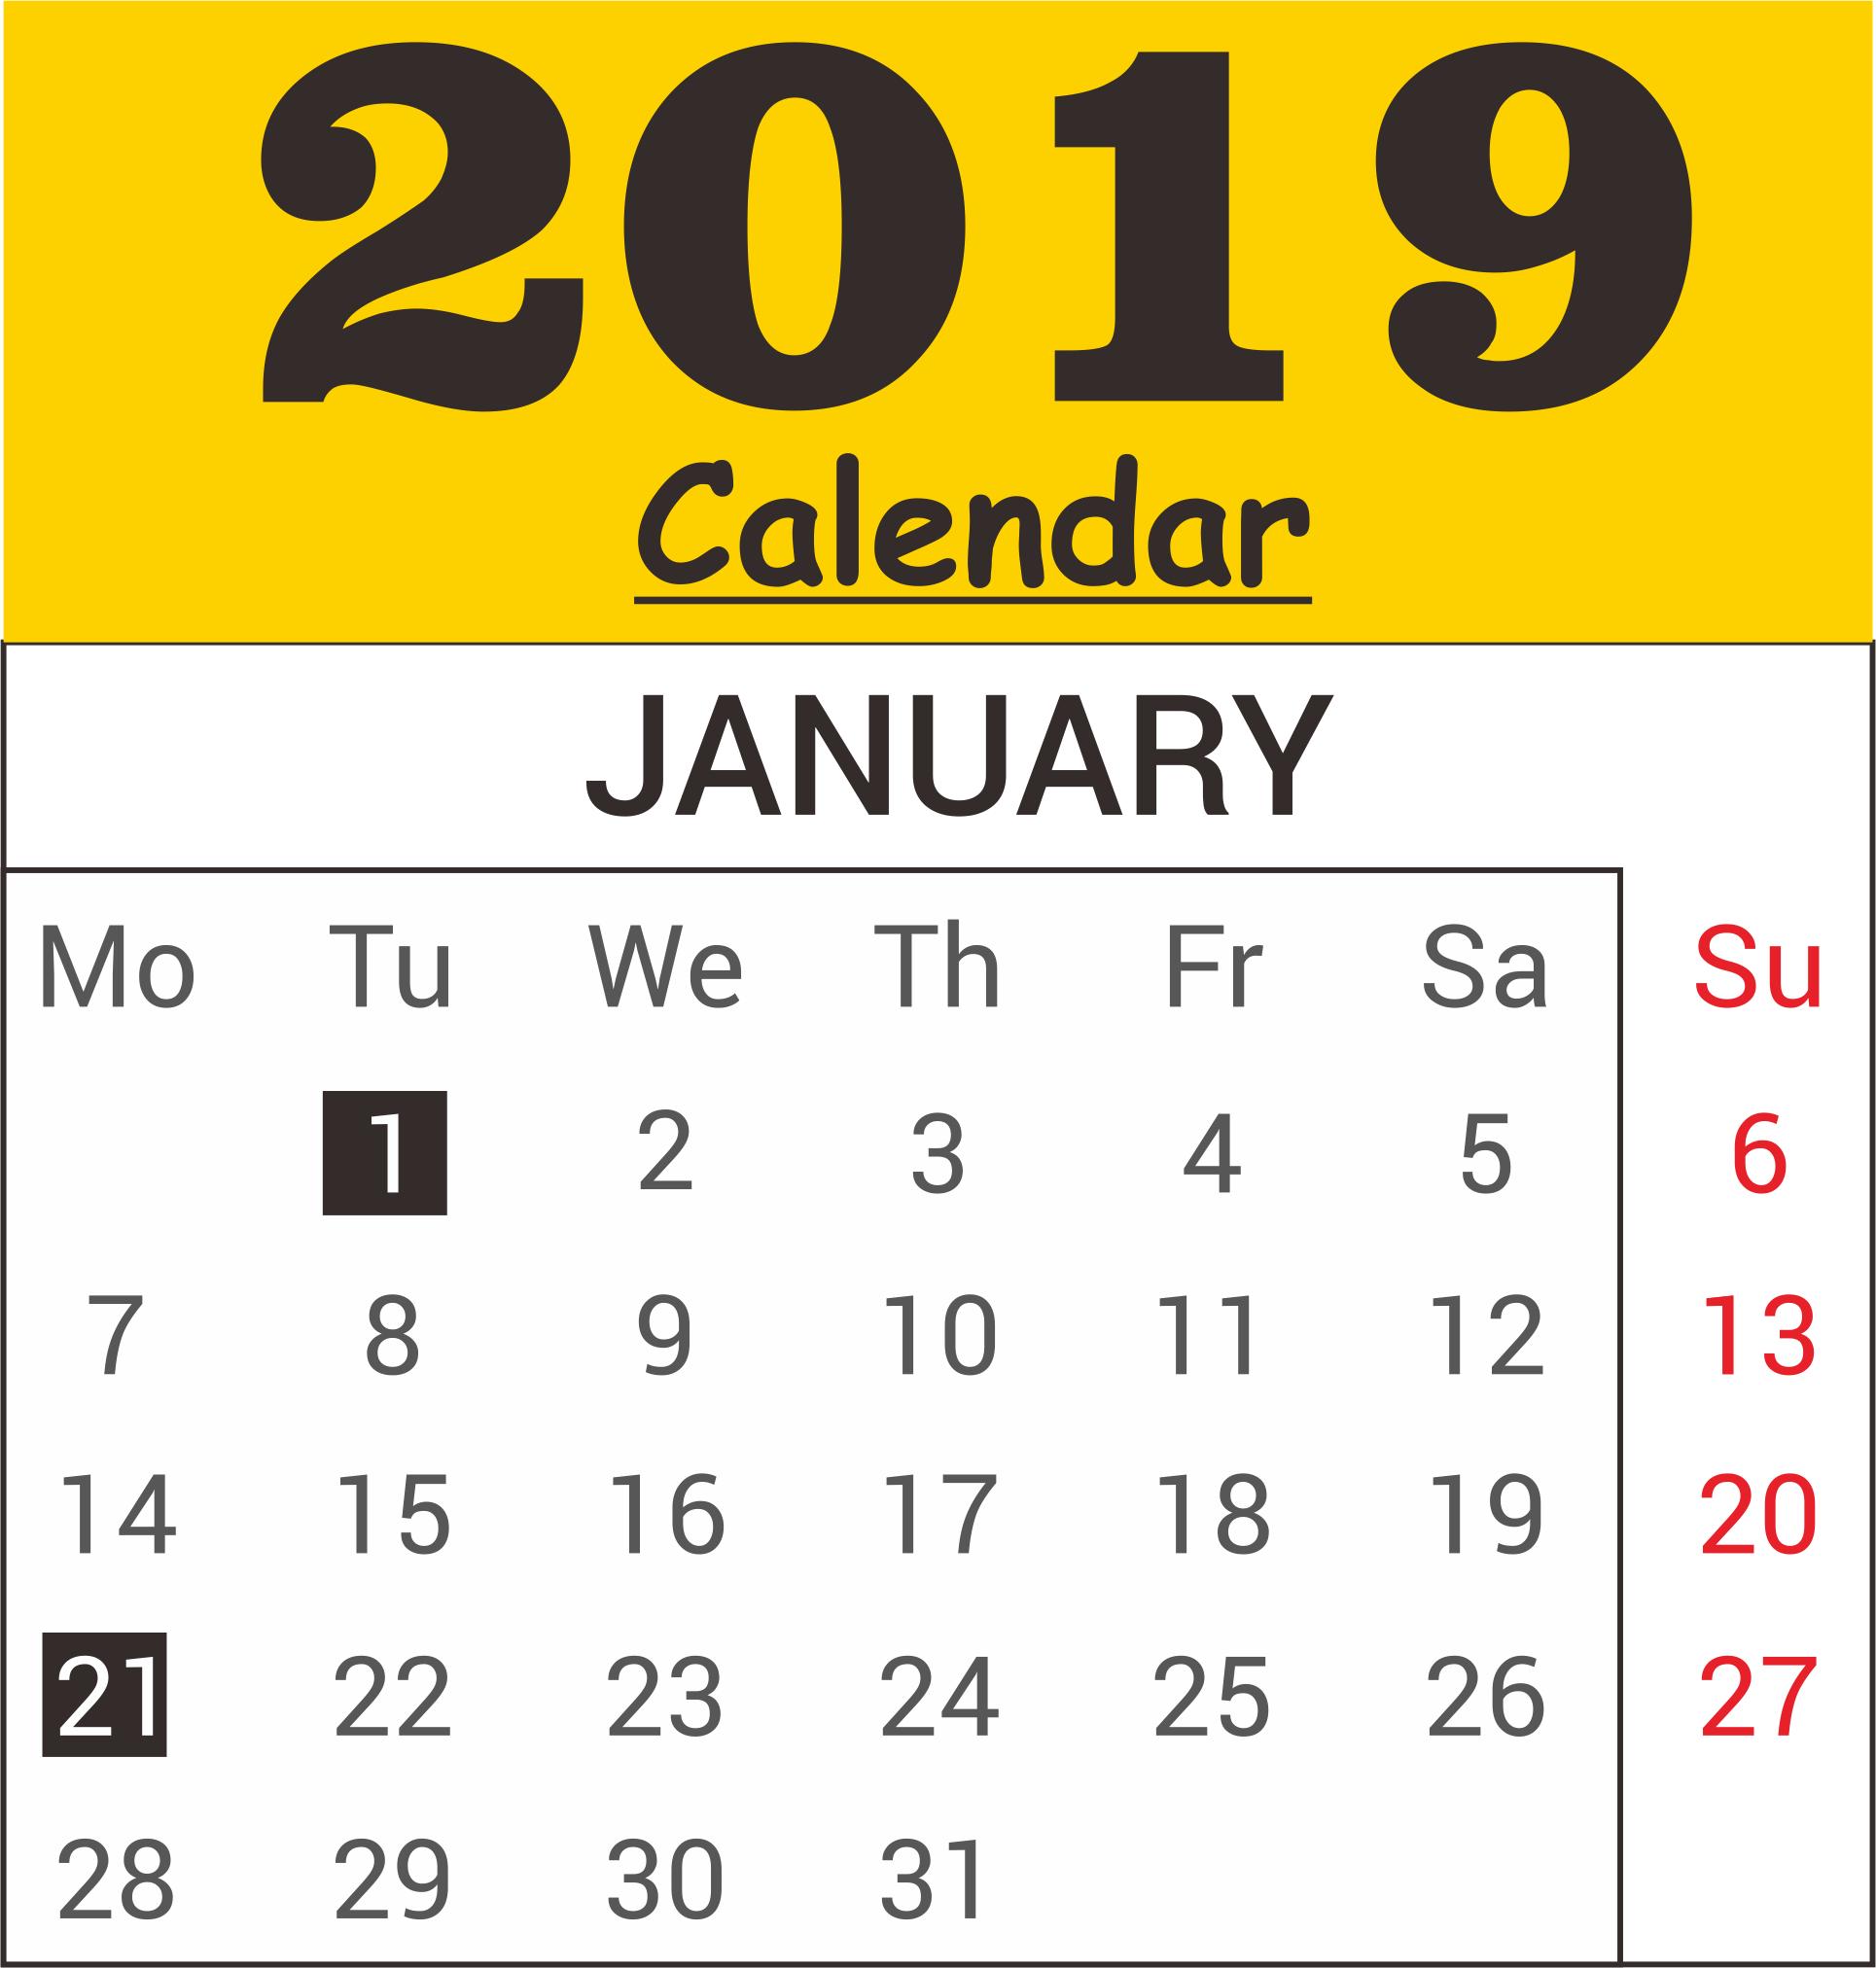 January 2019 Calendar Word